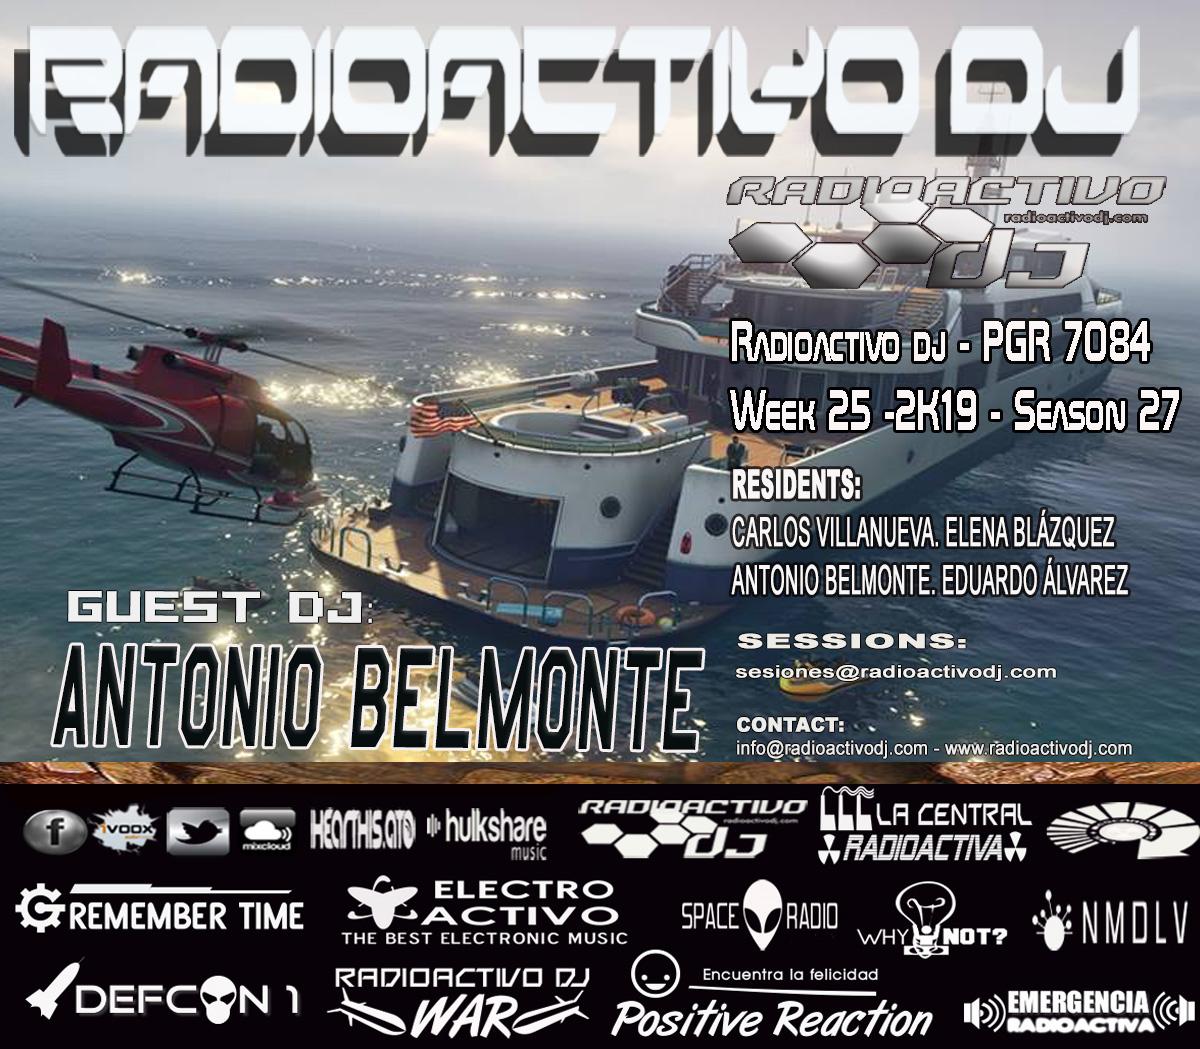 RADIOACTIVO-DJ-25-2019